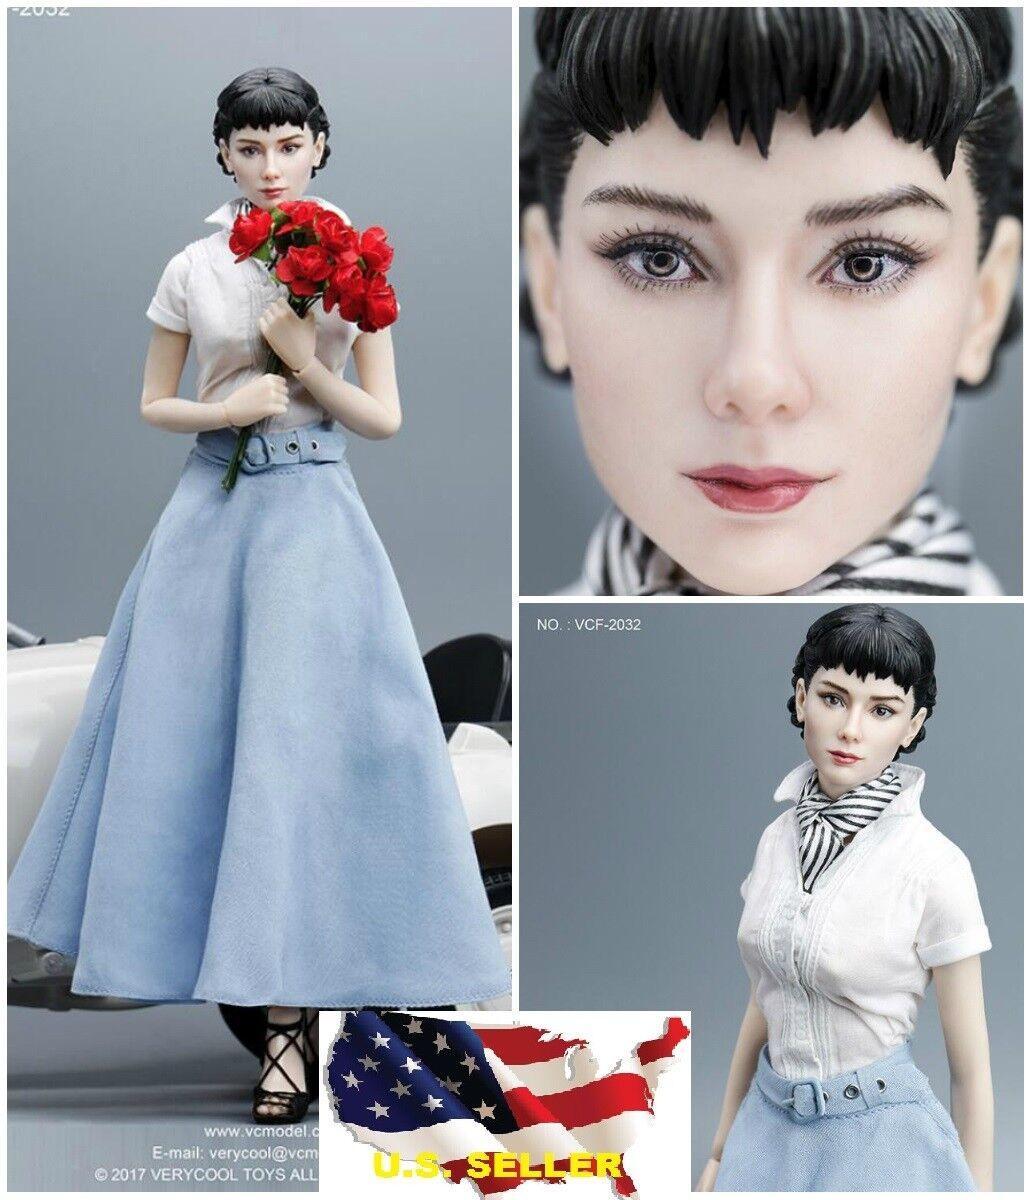 Escala 1/6 Audrey Hepburn Completo Figura Set VCF-2032 Romano Vacaciones Toys Hot  USA